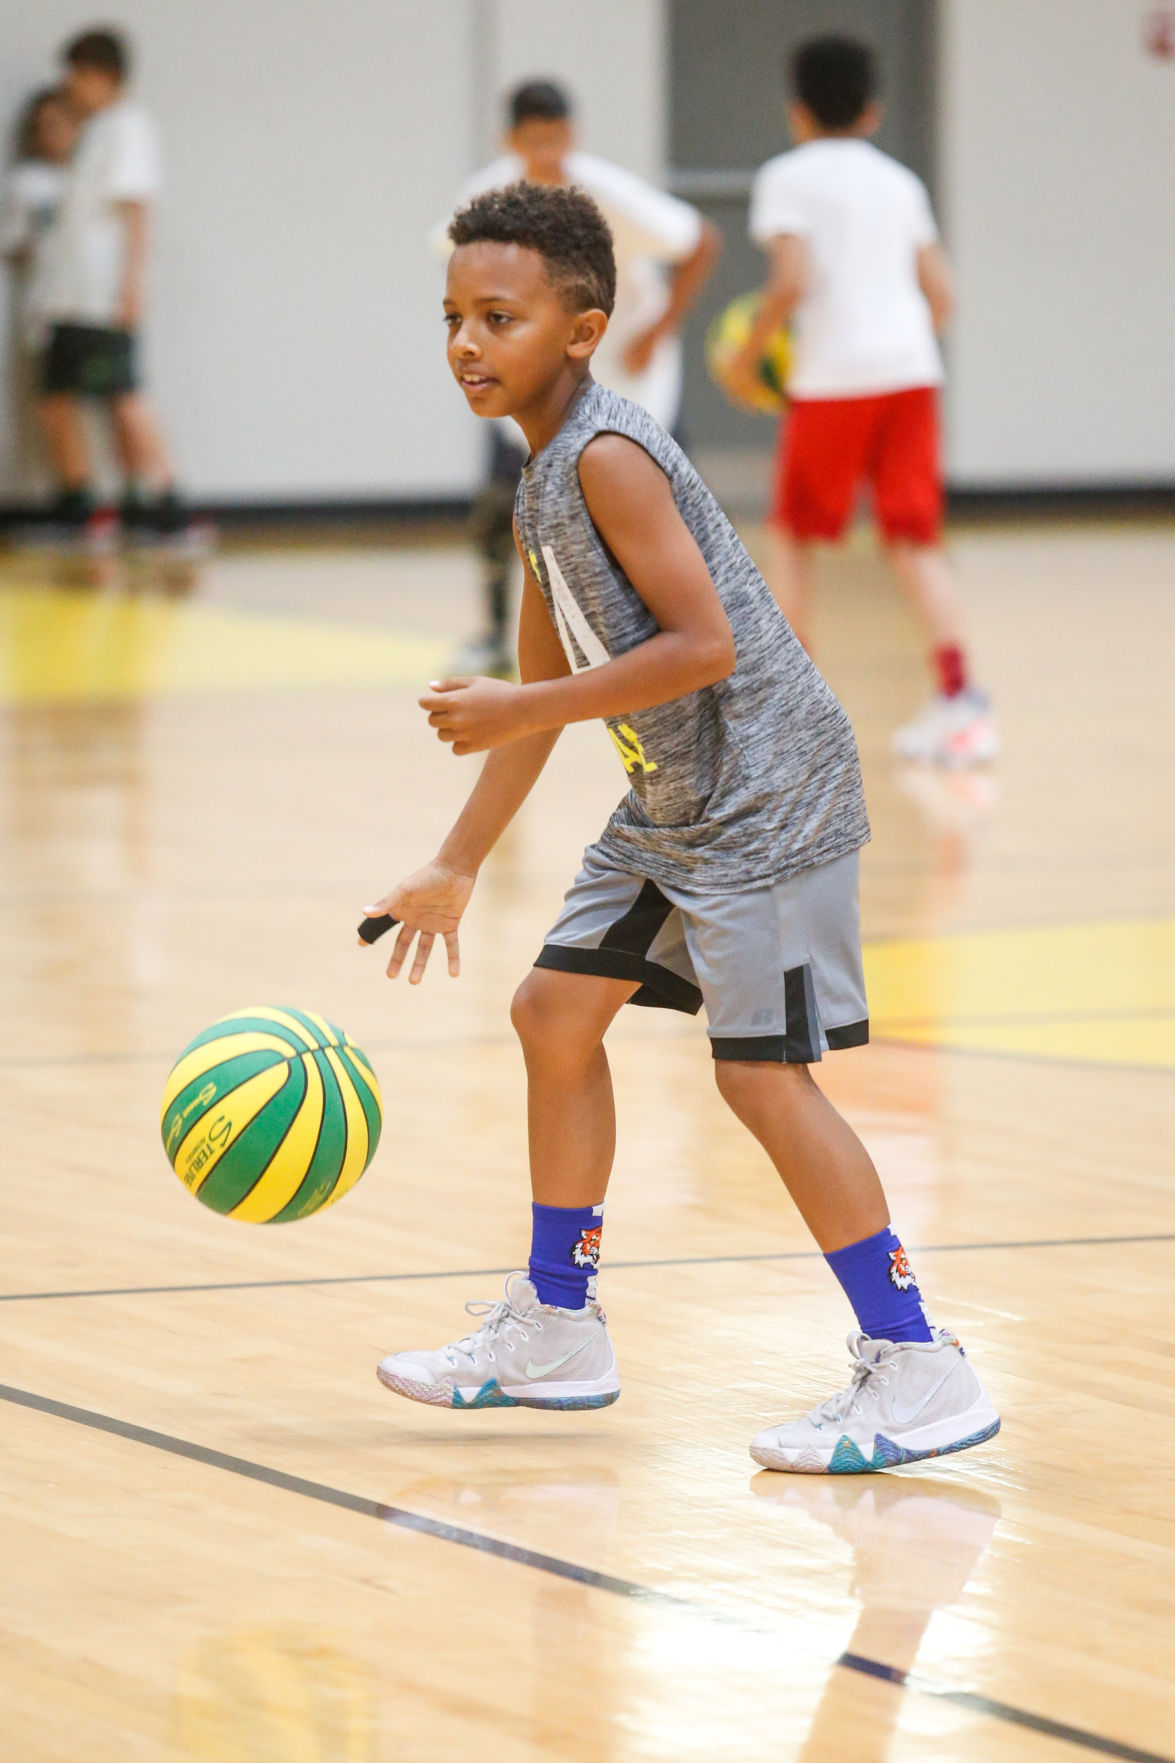 PJC Basketball Camp